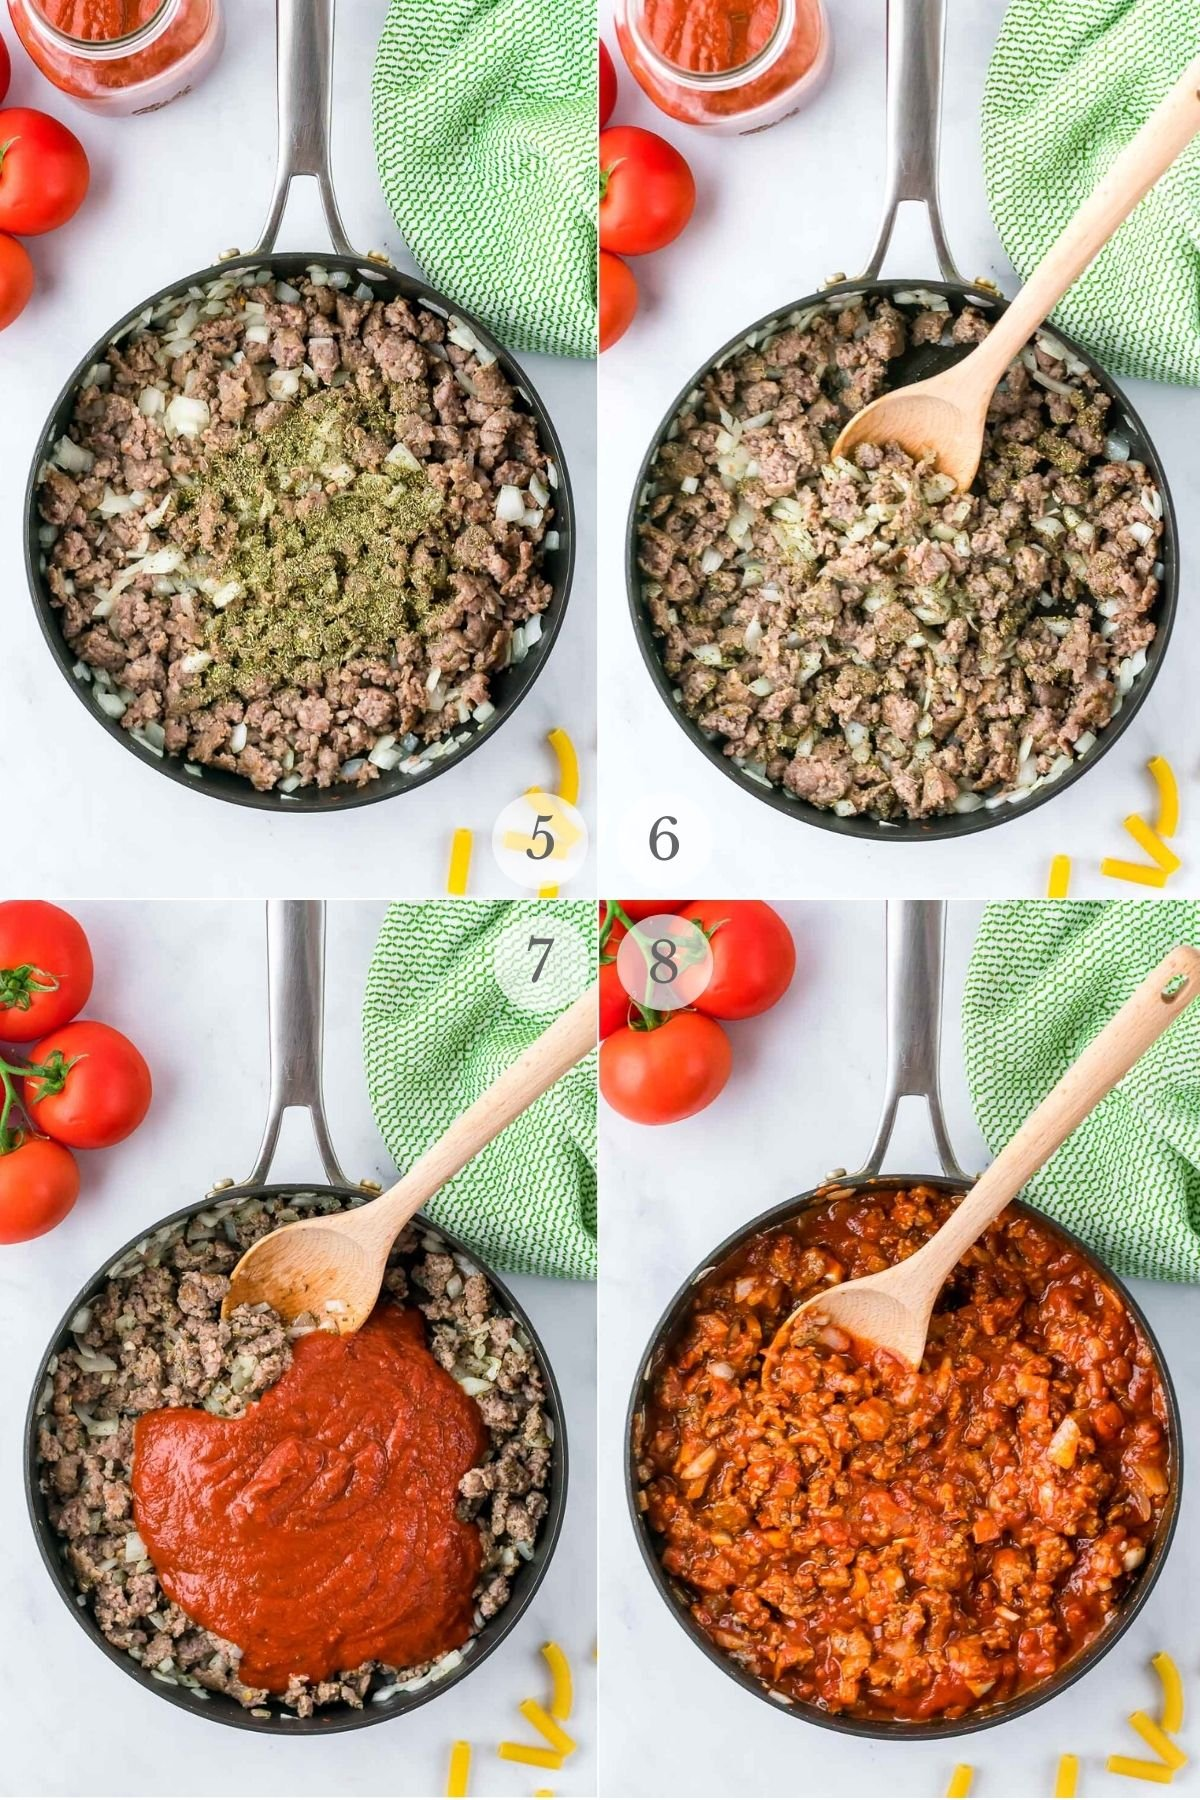 baked ziti recipe steps 5-8